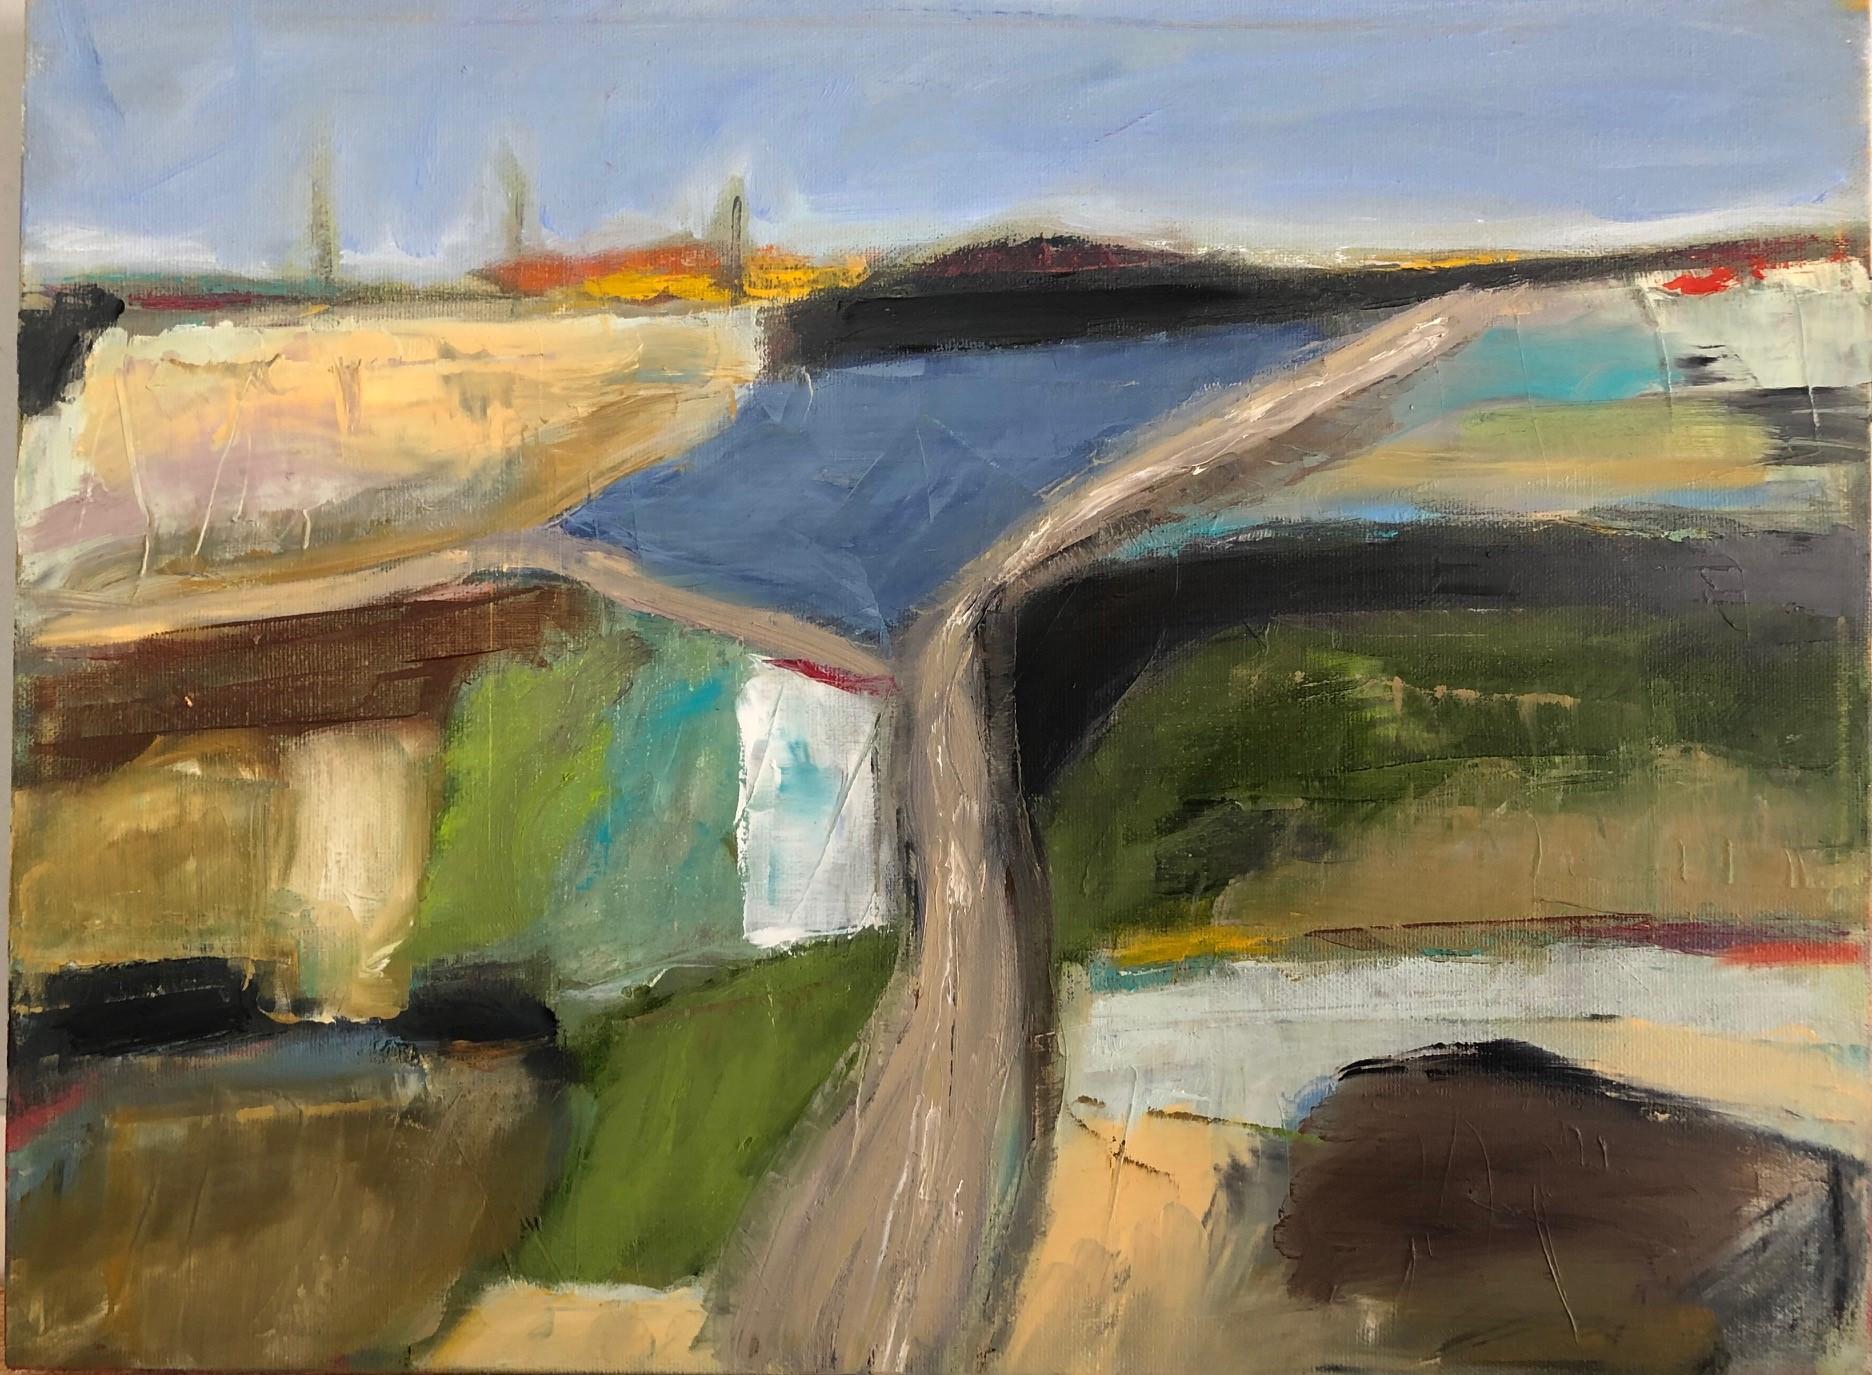 "Horizon 12"" x 16"", Oil on canvas $300"